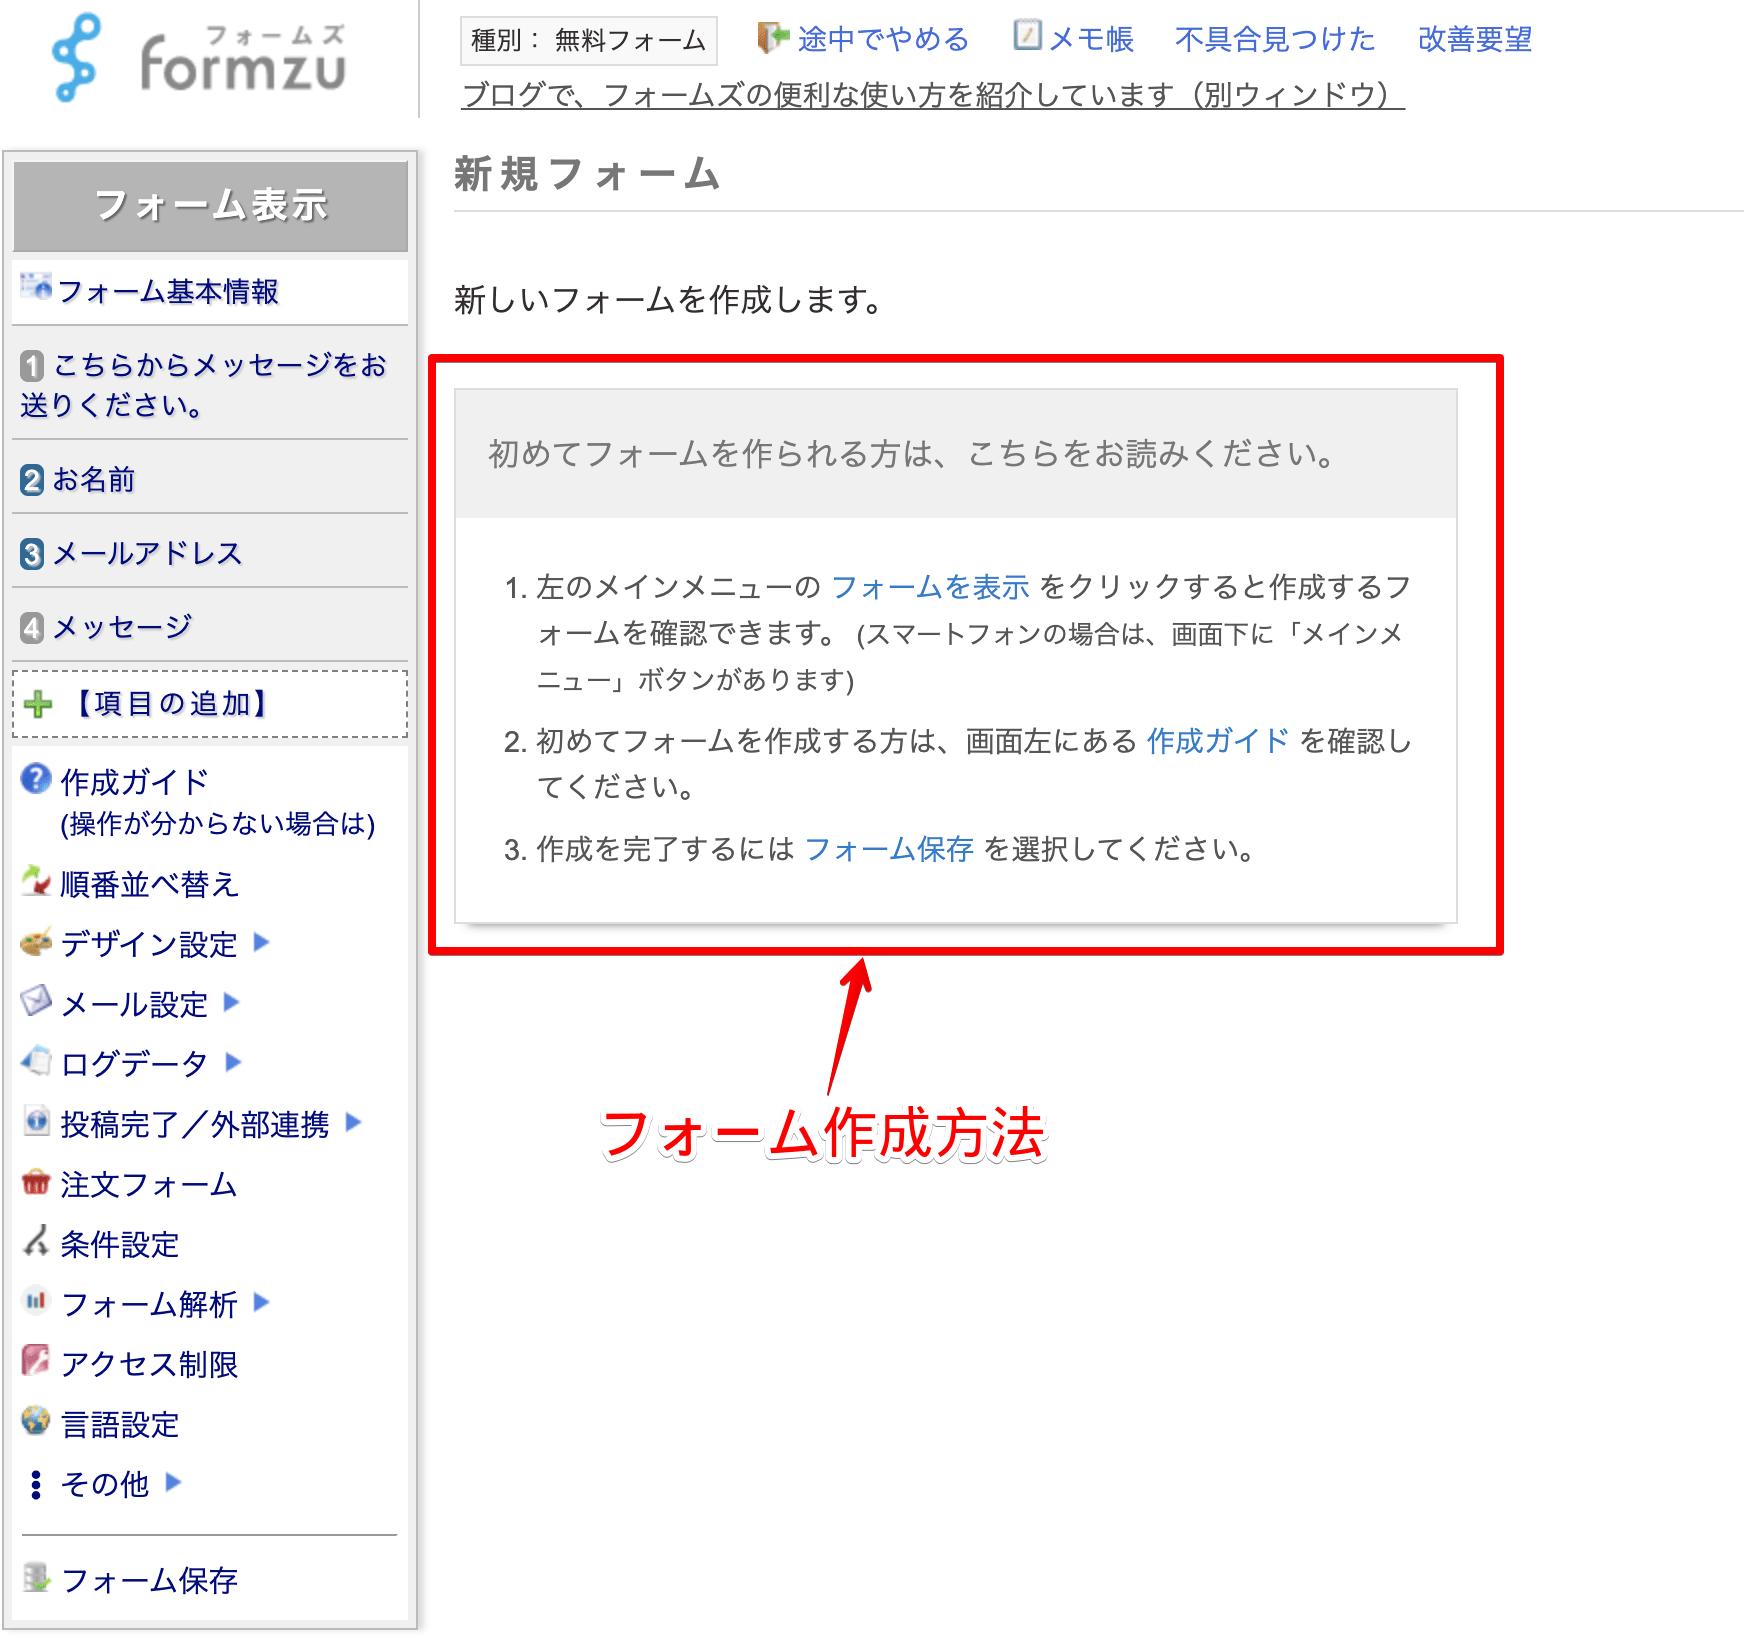 image11-min.png